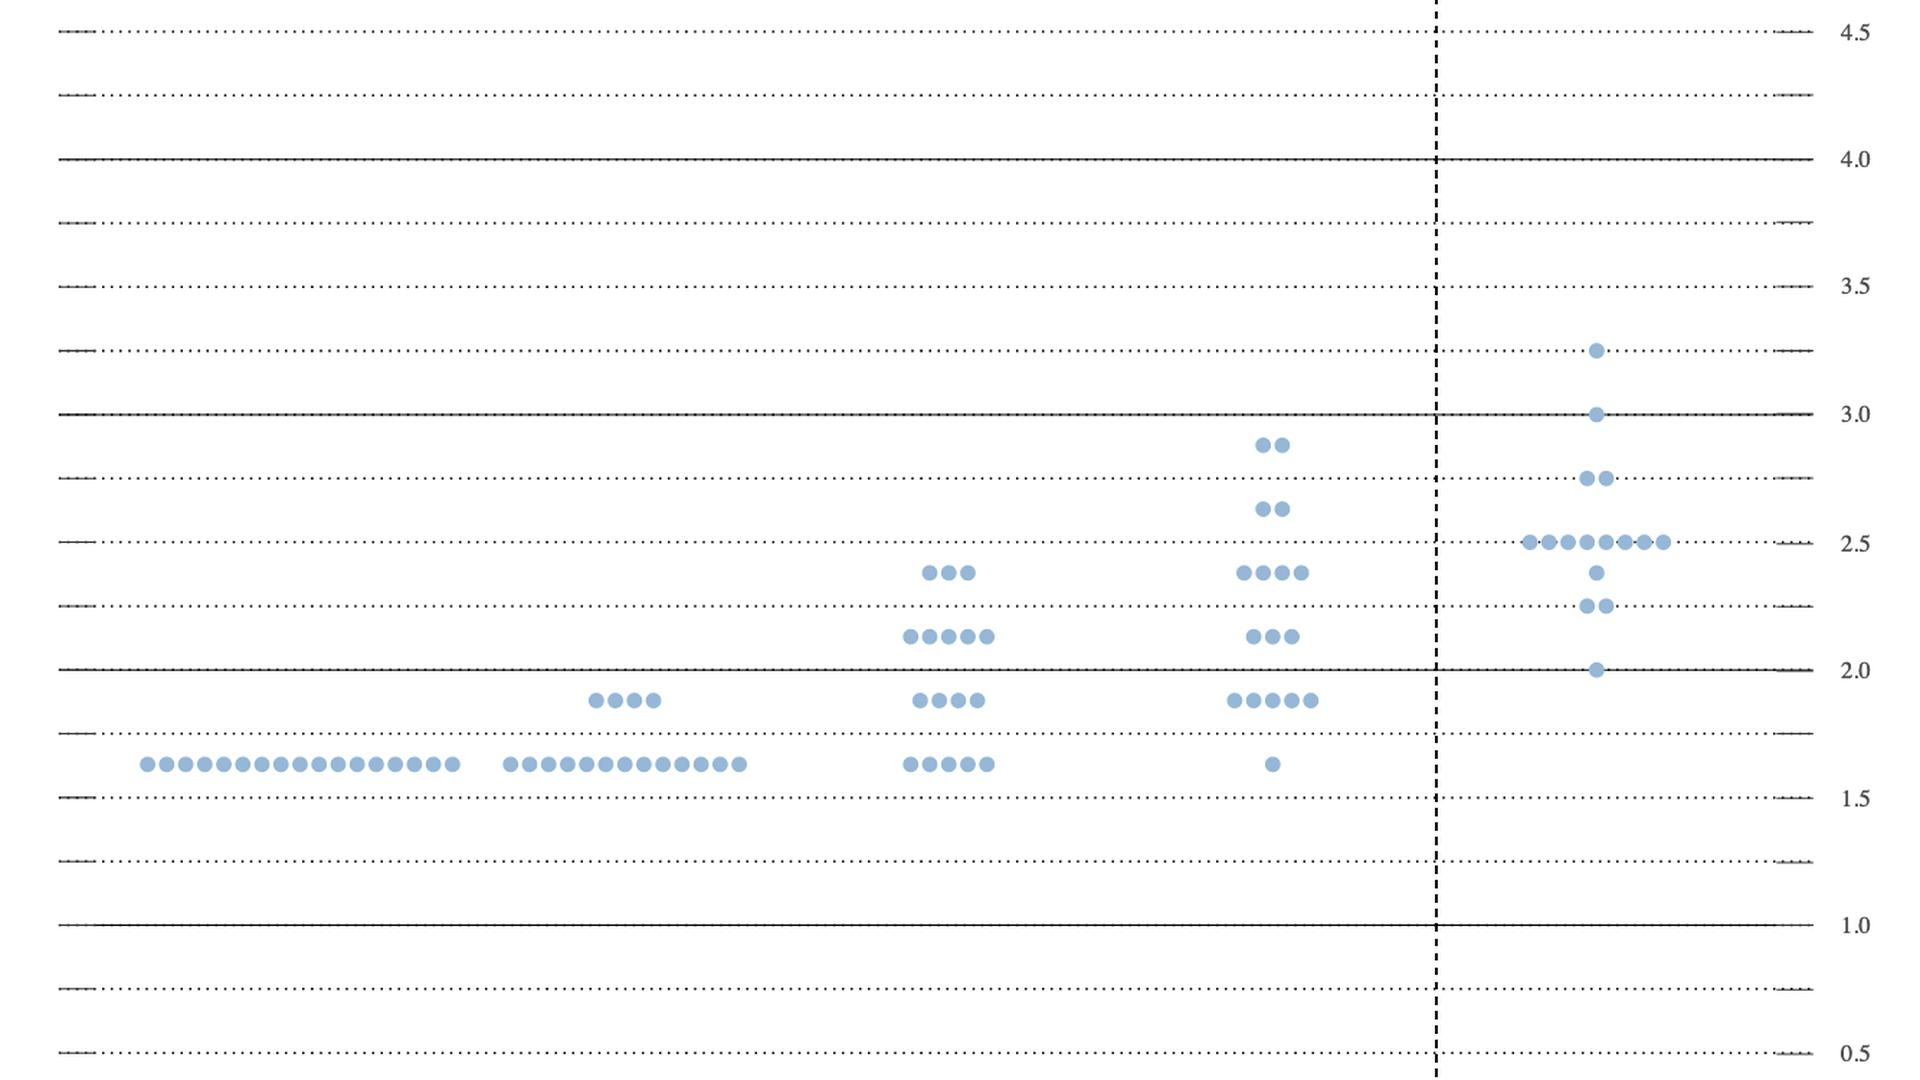 Screenshot of the Fed's dot plot